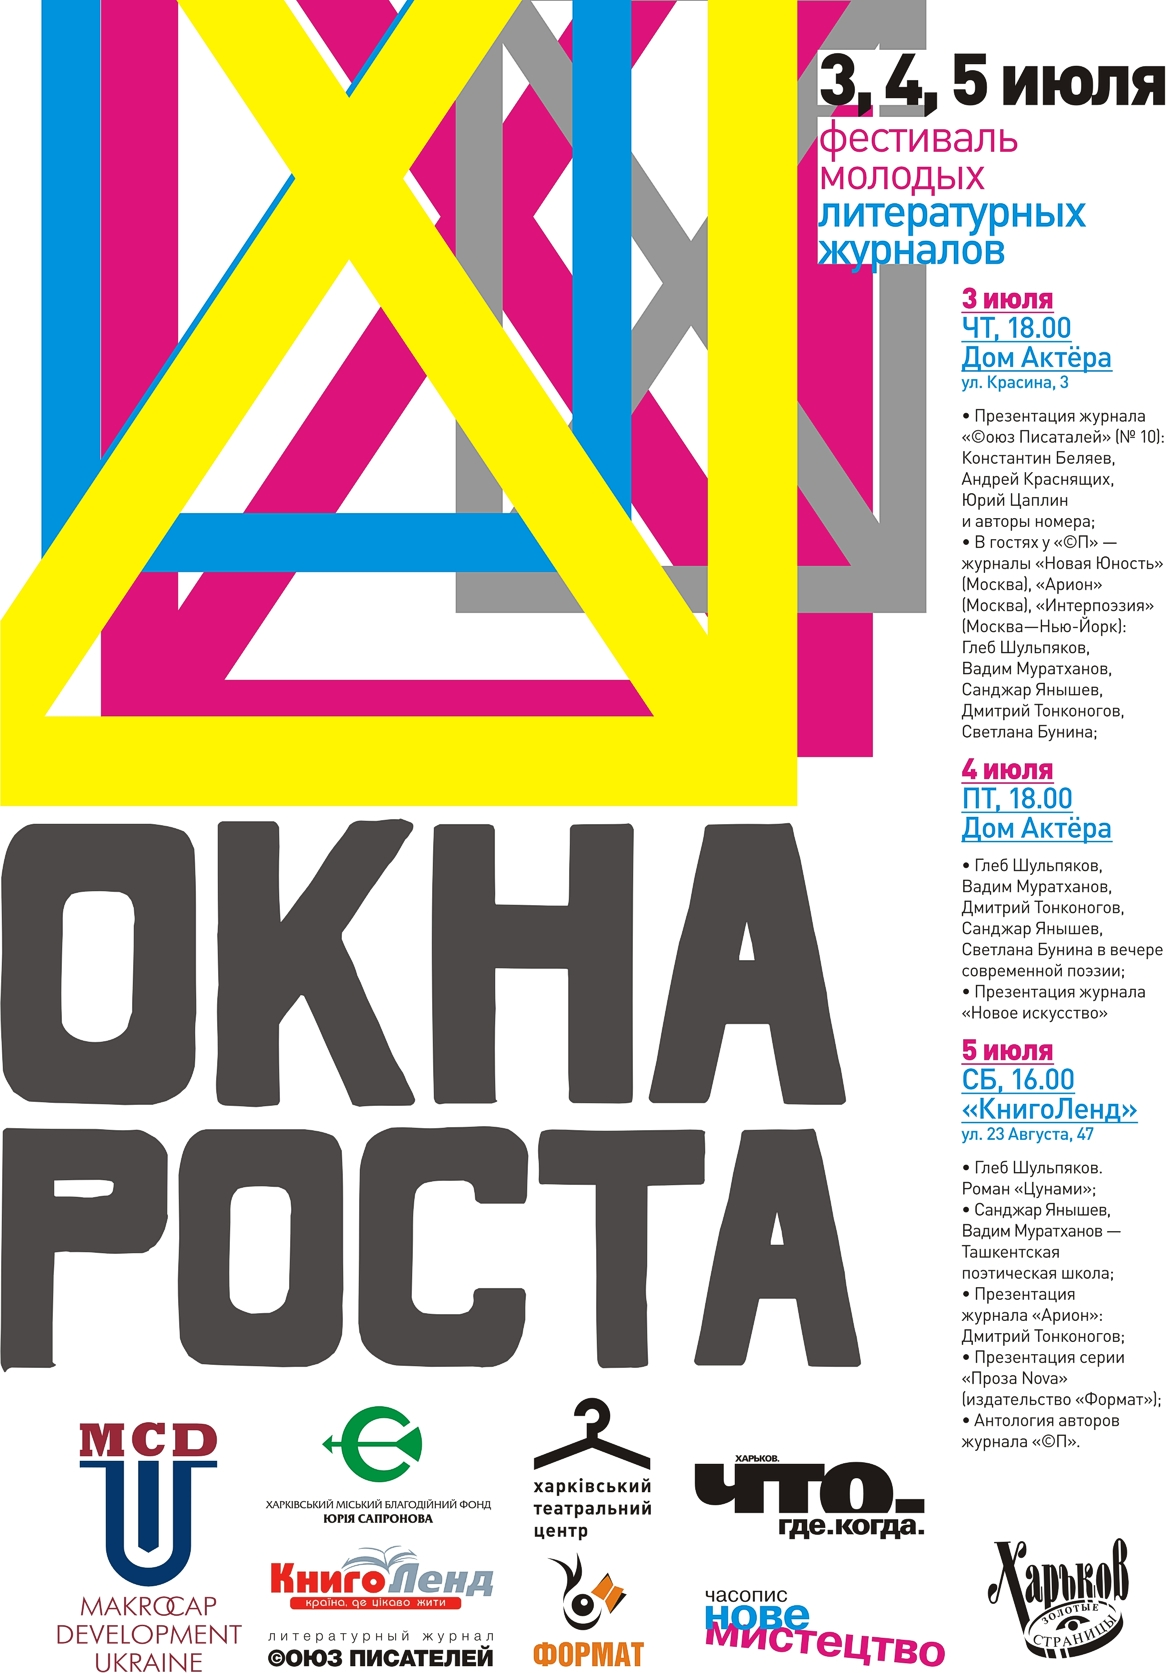 Журналы по педагогике 2013 читать онлайн